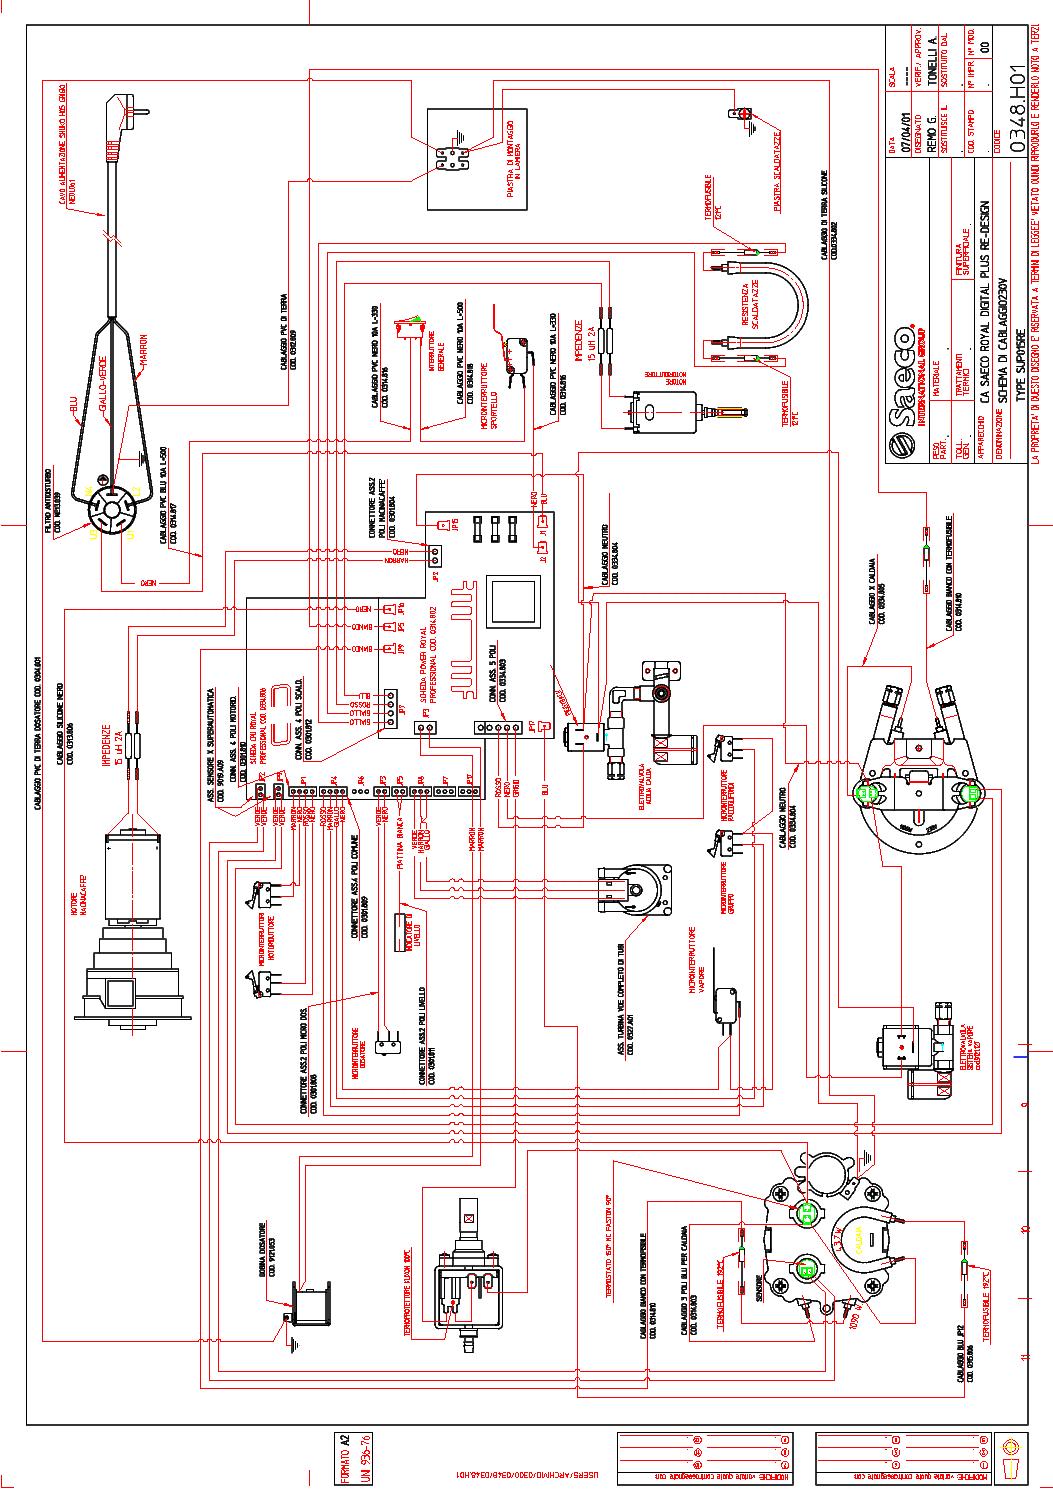 Pid Temp Controller Wiring Diagram Not Lossing Temperature La Pavoni Diagrams Thermos 5500w 240v